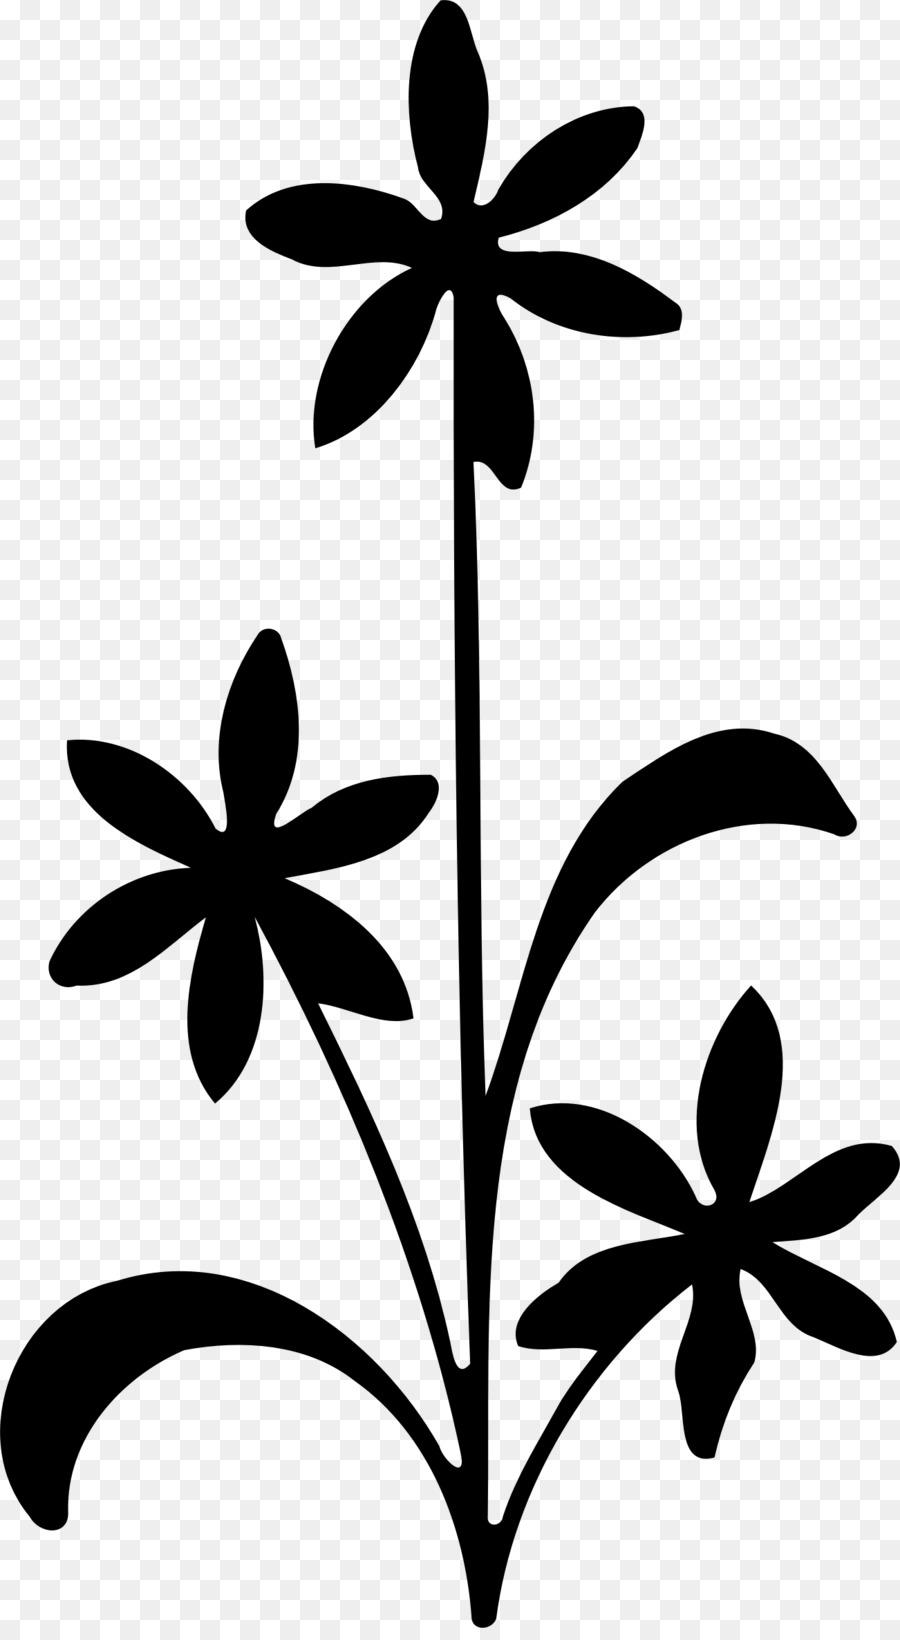 900x1640 Flower Silhouette Visual Arts Clip Art